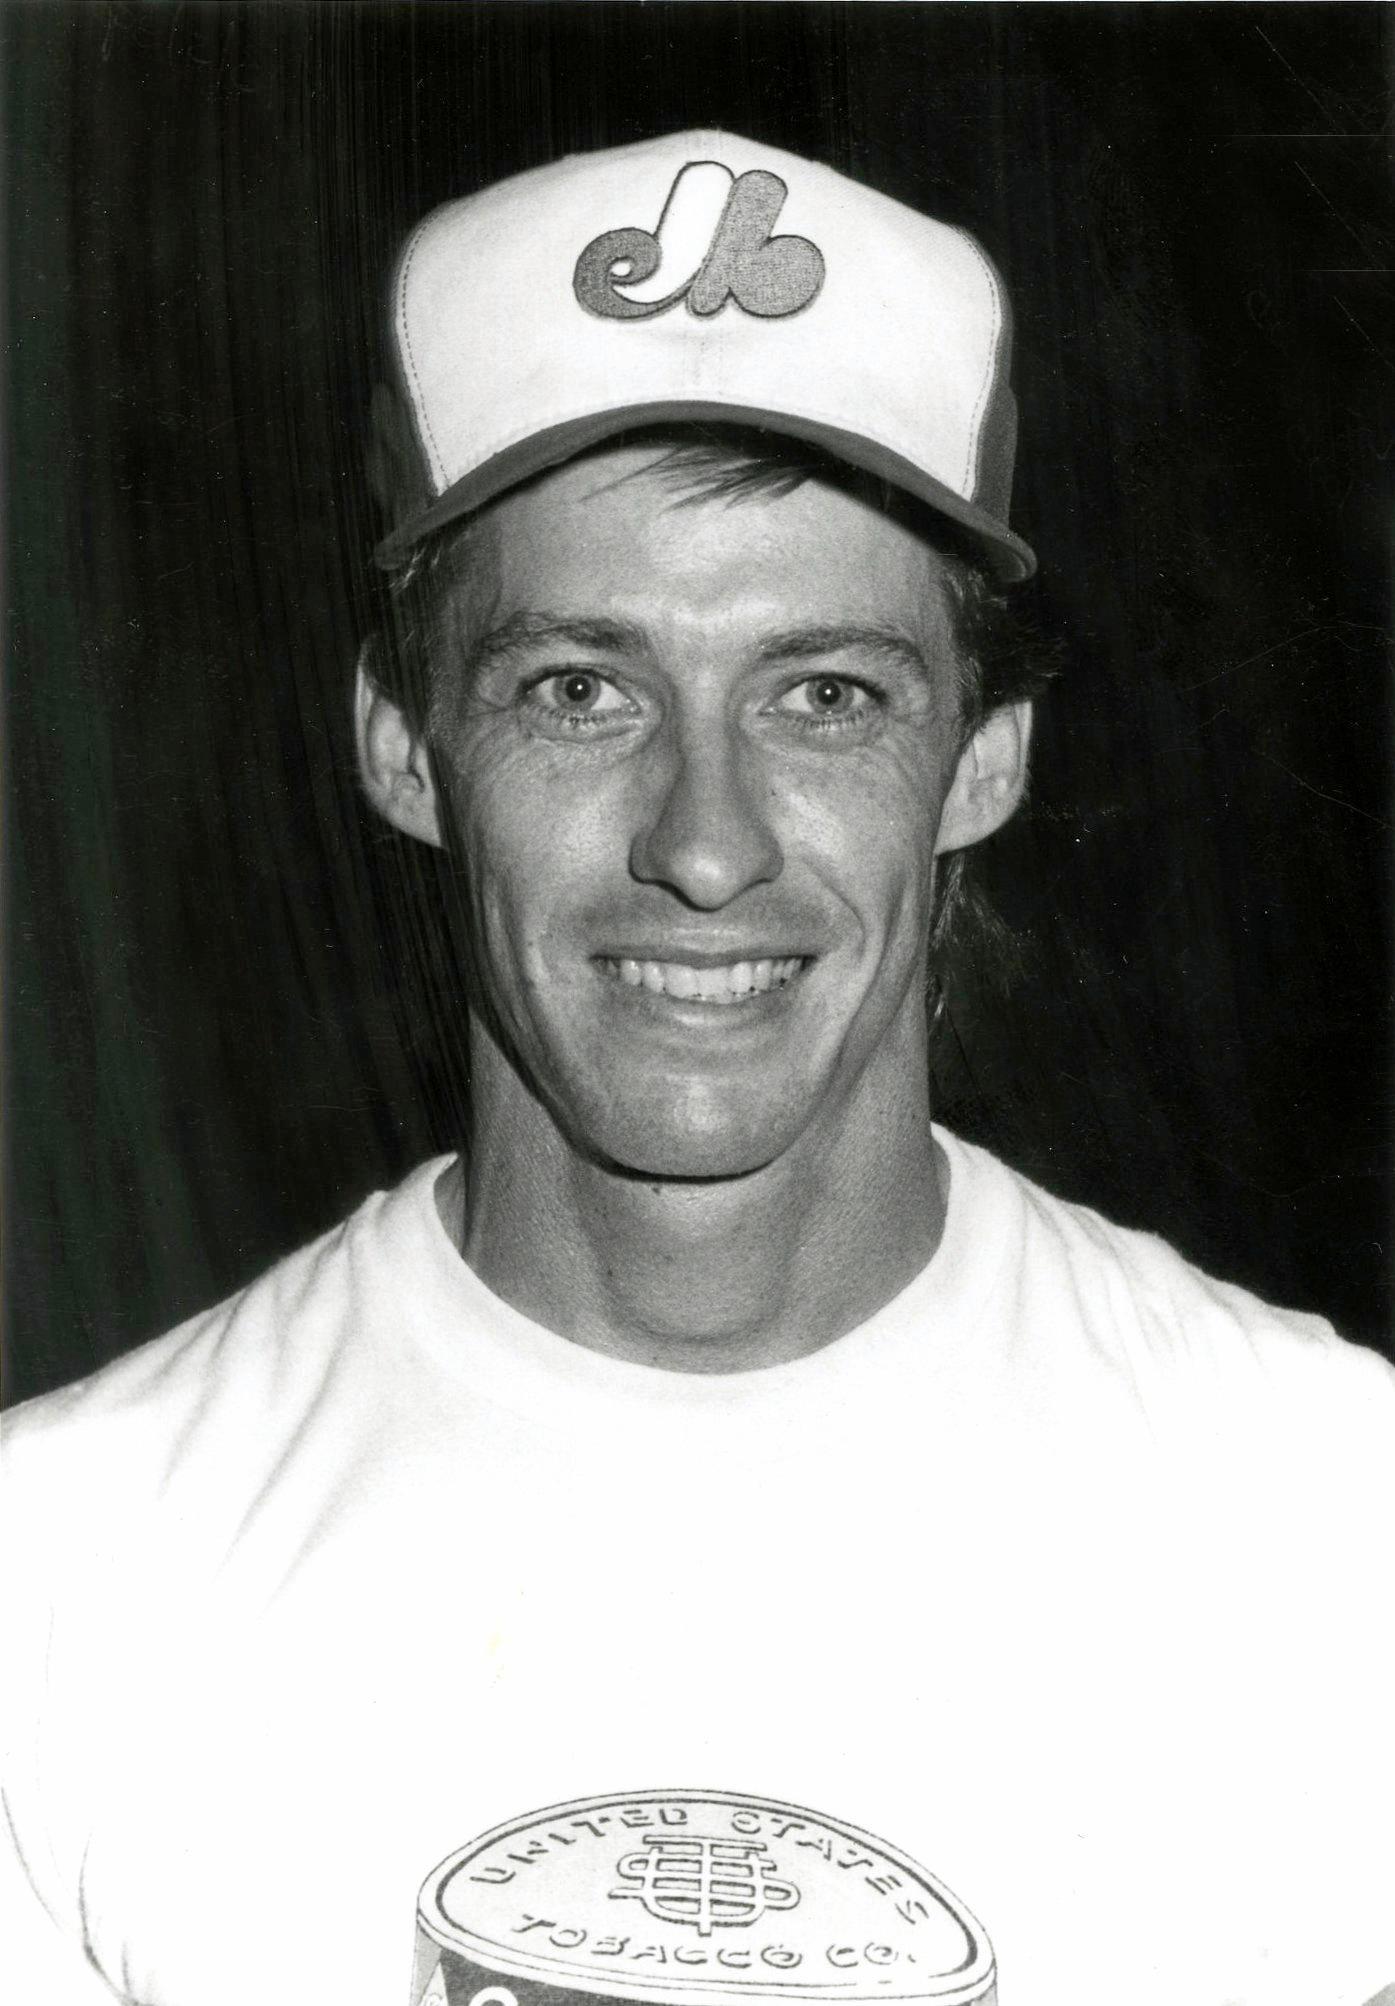 Former Ipswich and Australian baseballer Peter Wood.